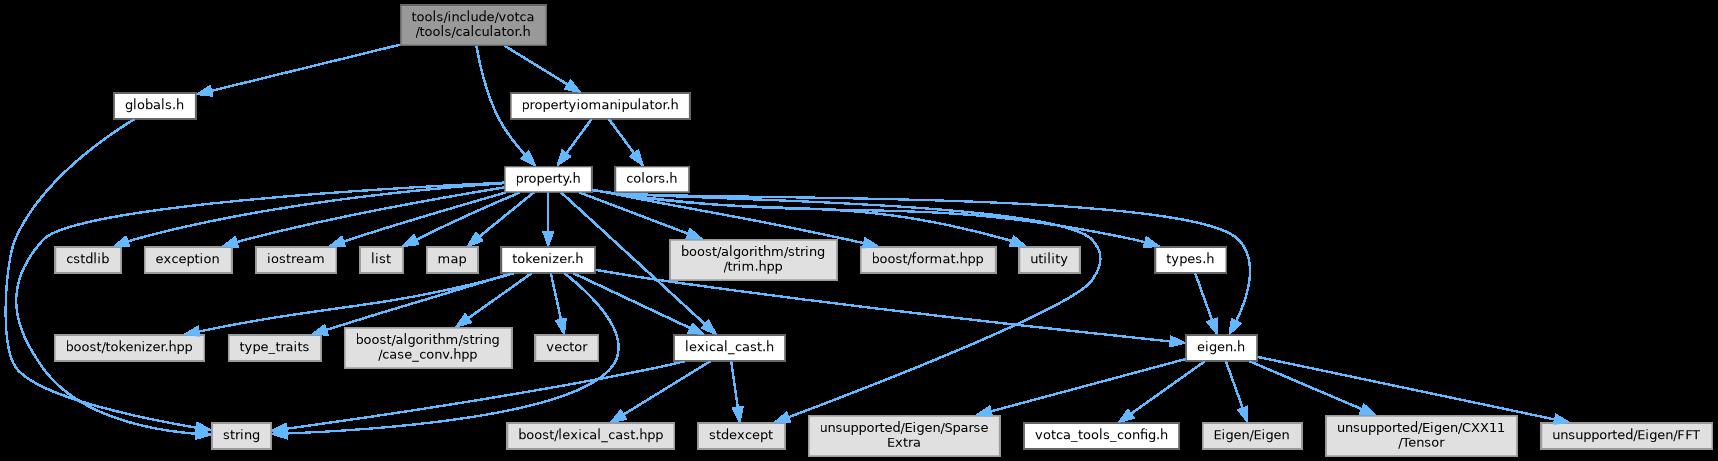 Votca homevotcavotcatoolsincludevotcatoolscalculatorh file include dependency graph for calculatorh ccuart Gallery